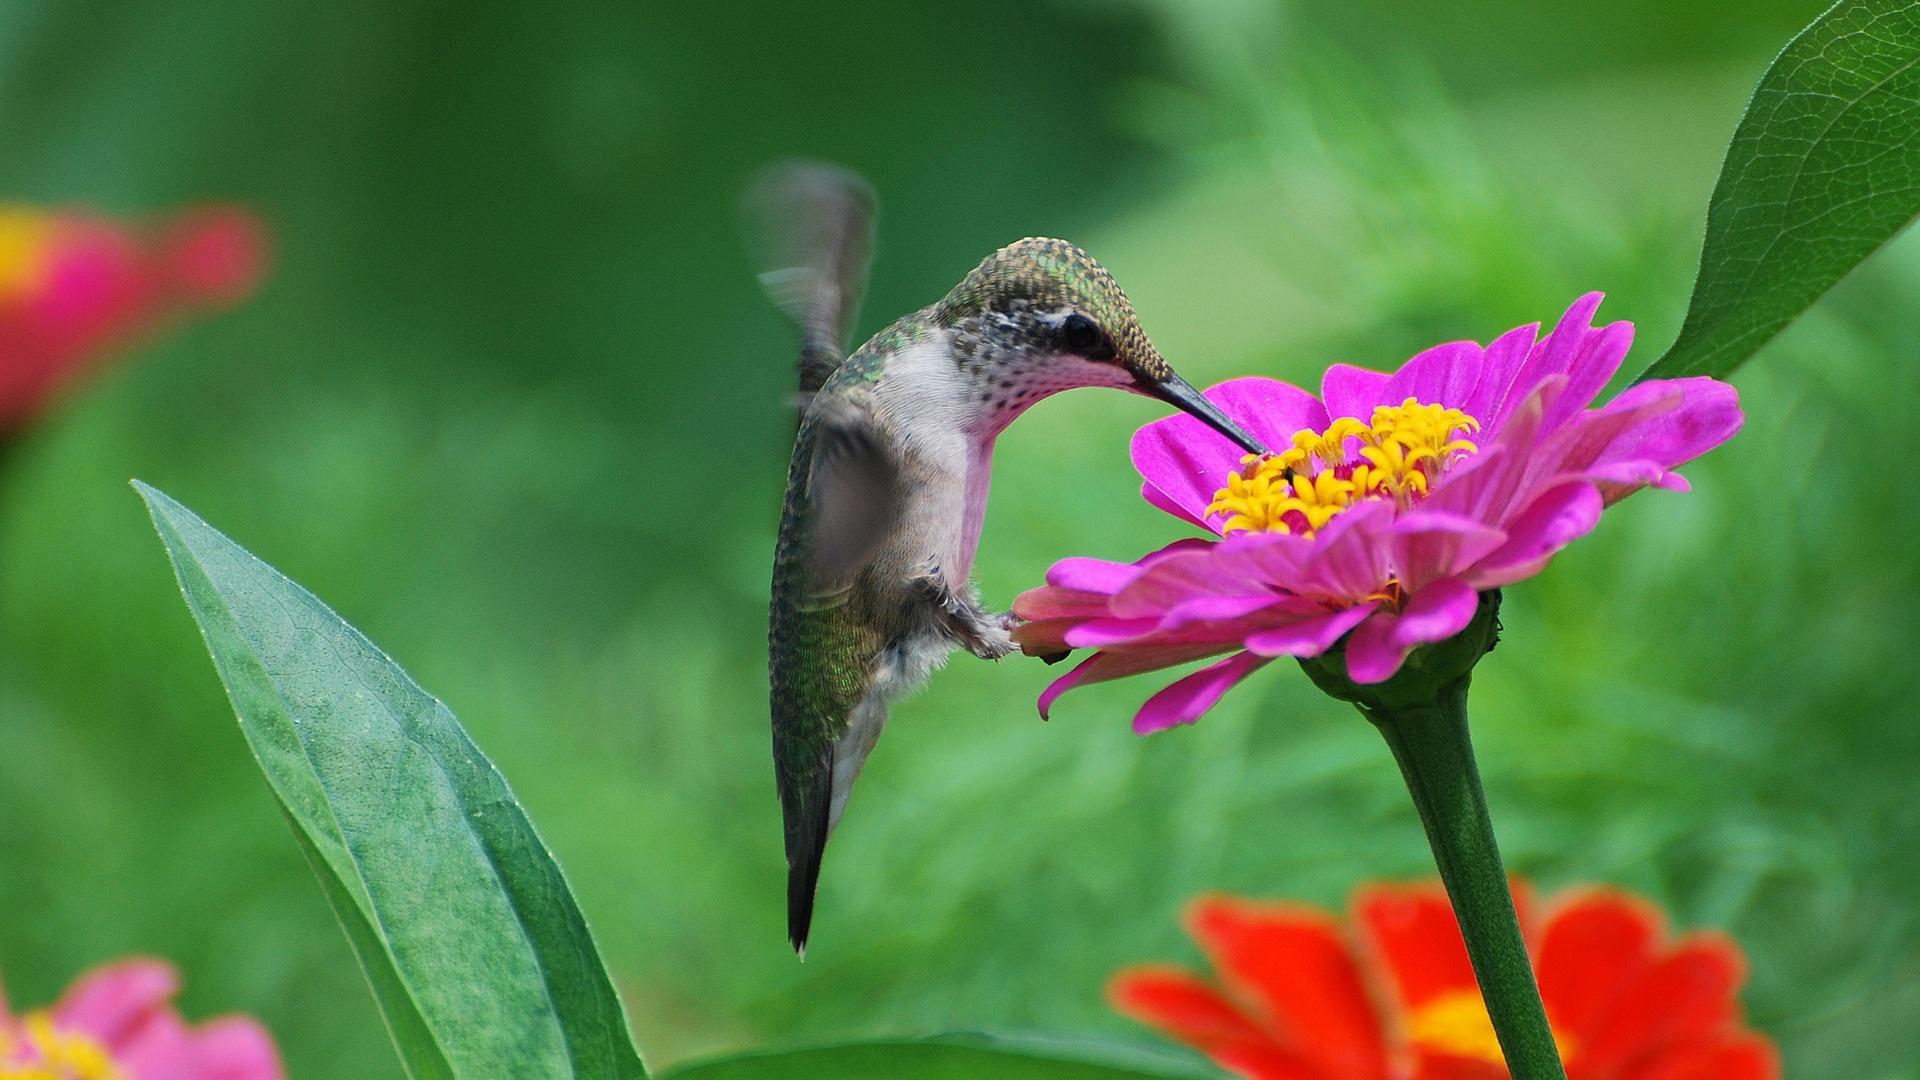 hummingbird pink flower nectar 1920x1080 jpg 1920 1080 beija